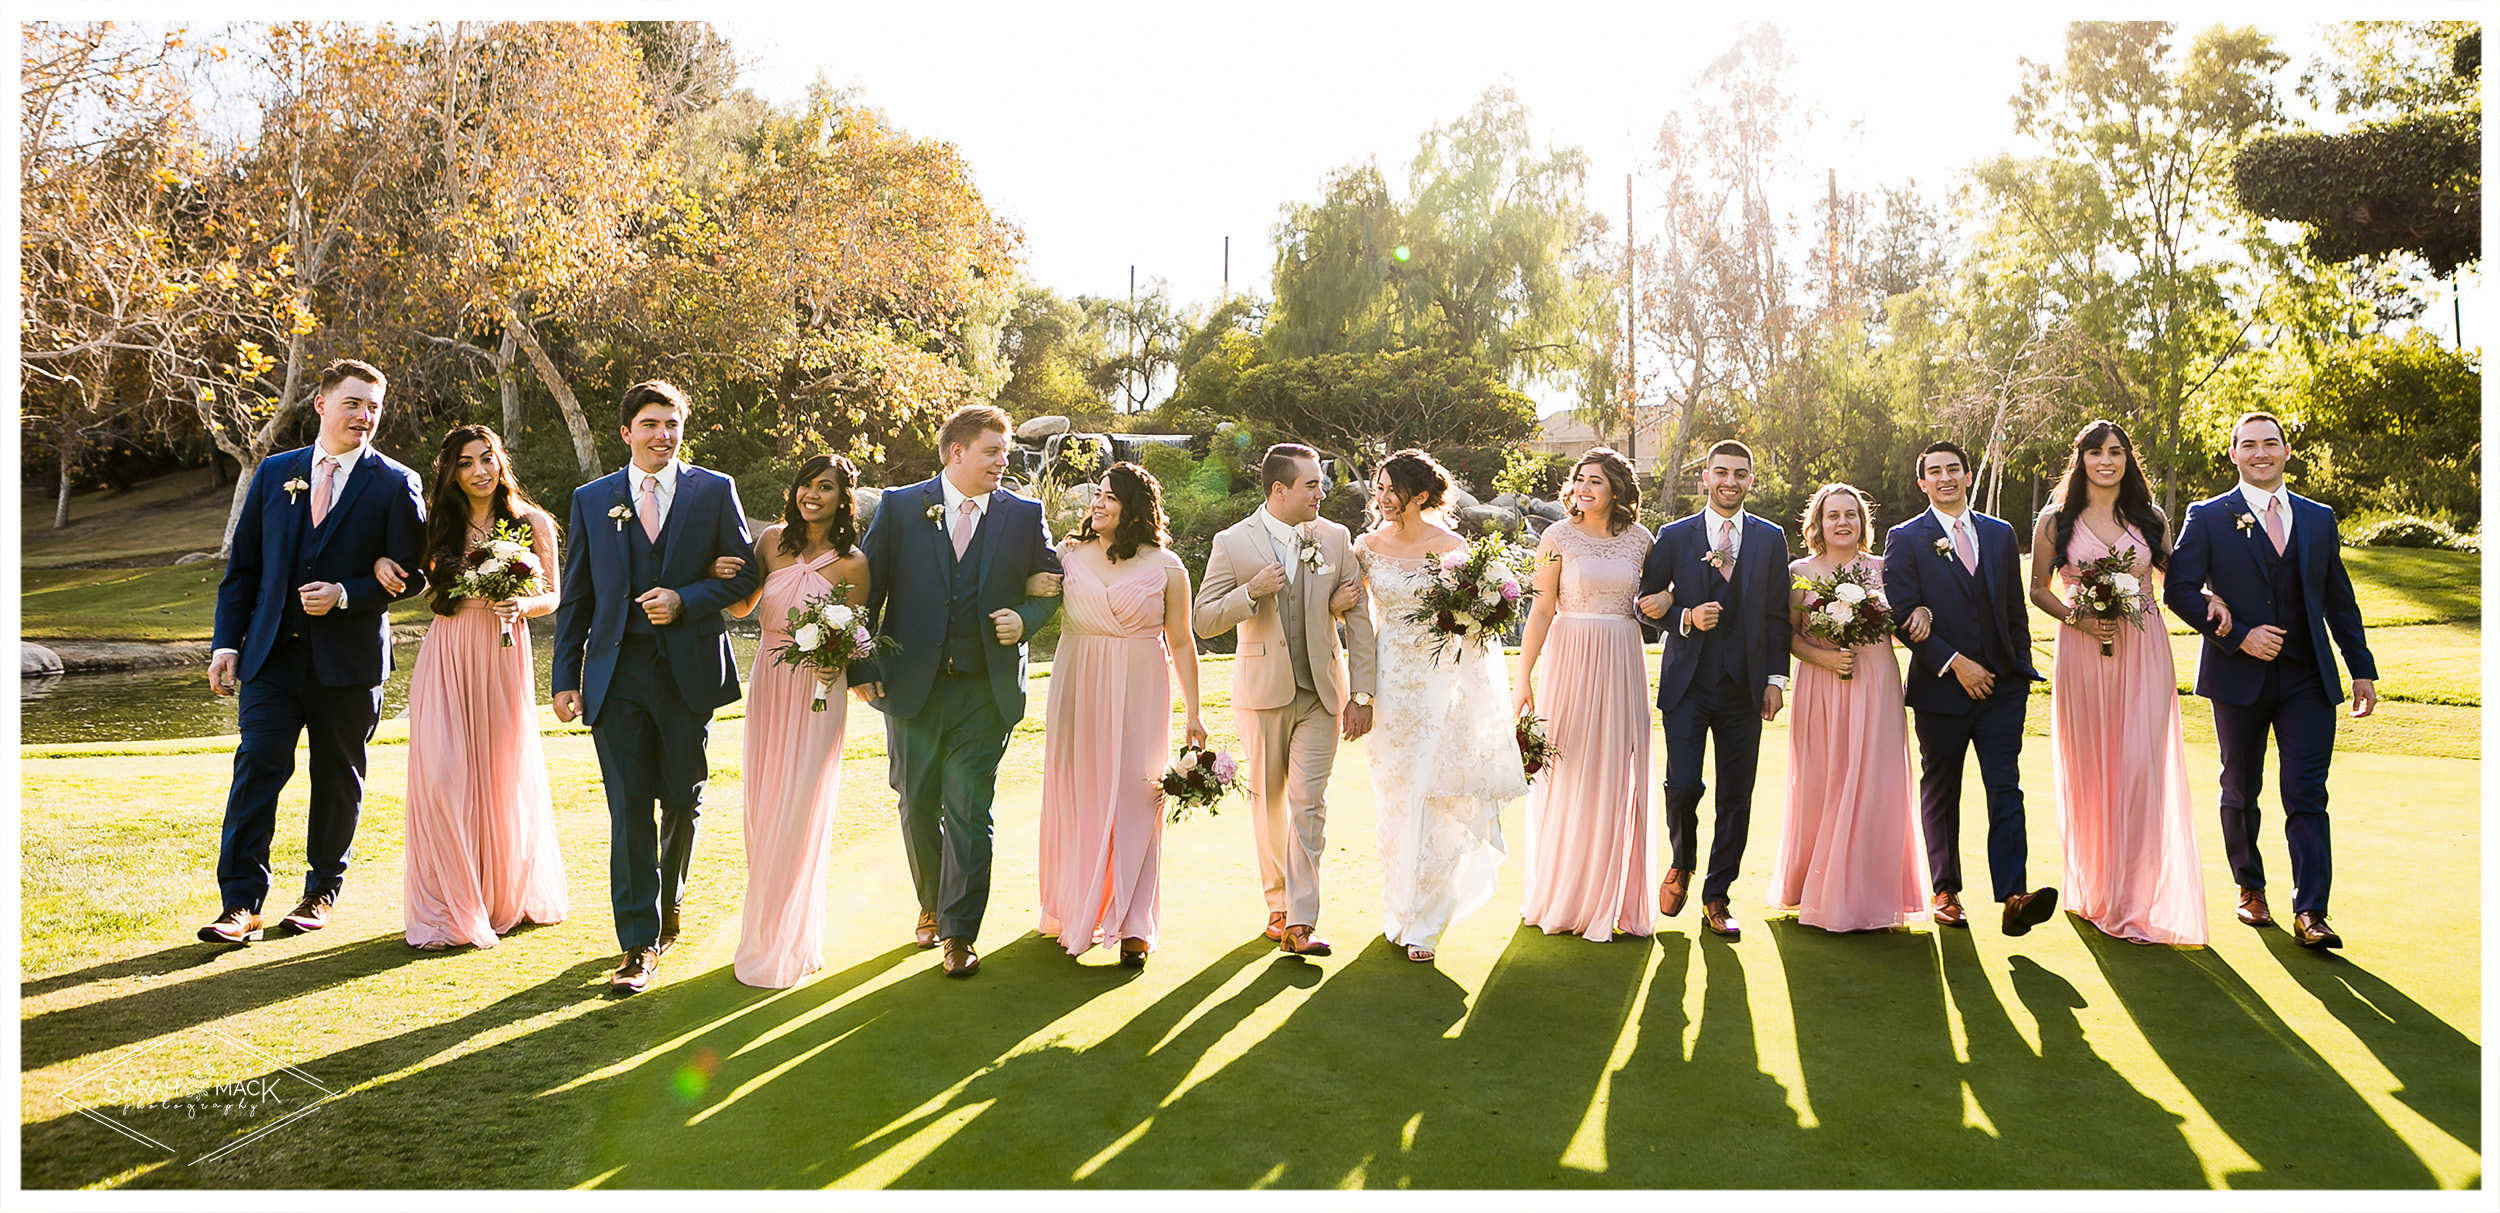 SA-Coyote-Hills-Golf-Course-Fullerton-Wedding-Photography-35.jpg